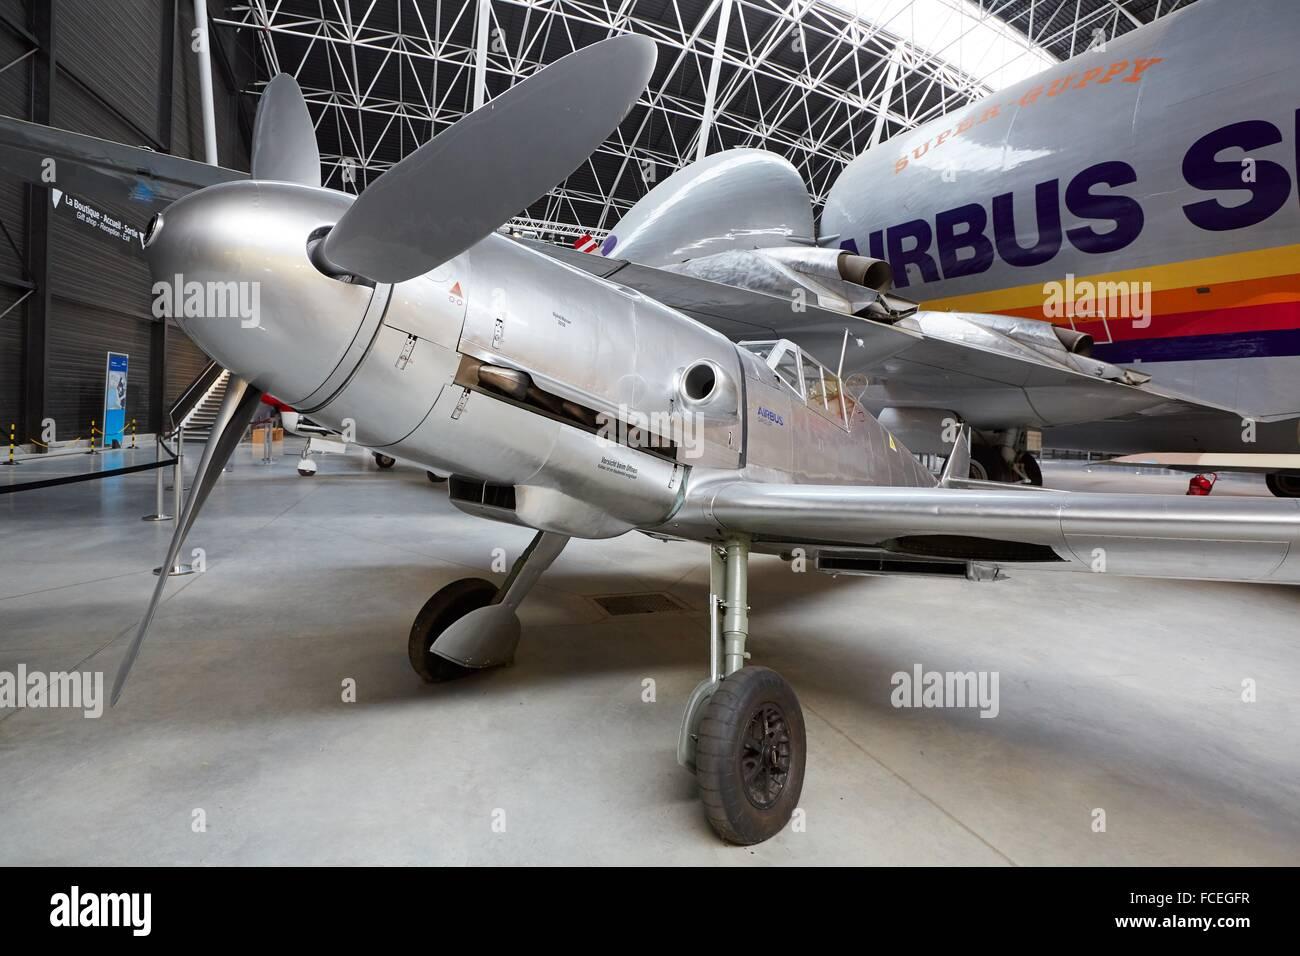 Messerschmitt Bf 109 and Super Guppy SGT aircraft. Aeroscopia. Aeronautical Museum. Toulouse. Haute Garonne. France. - Stock Image